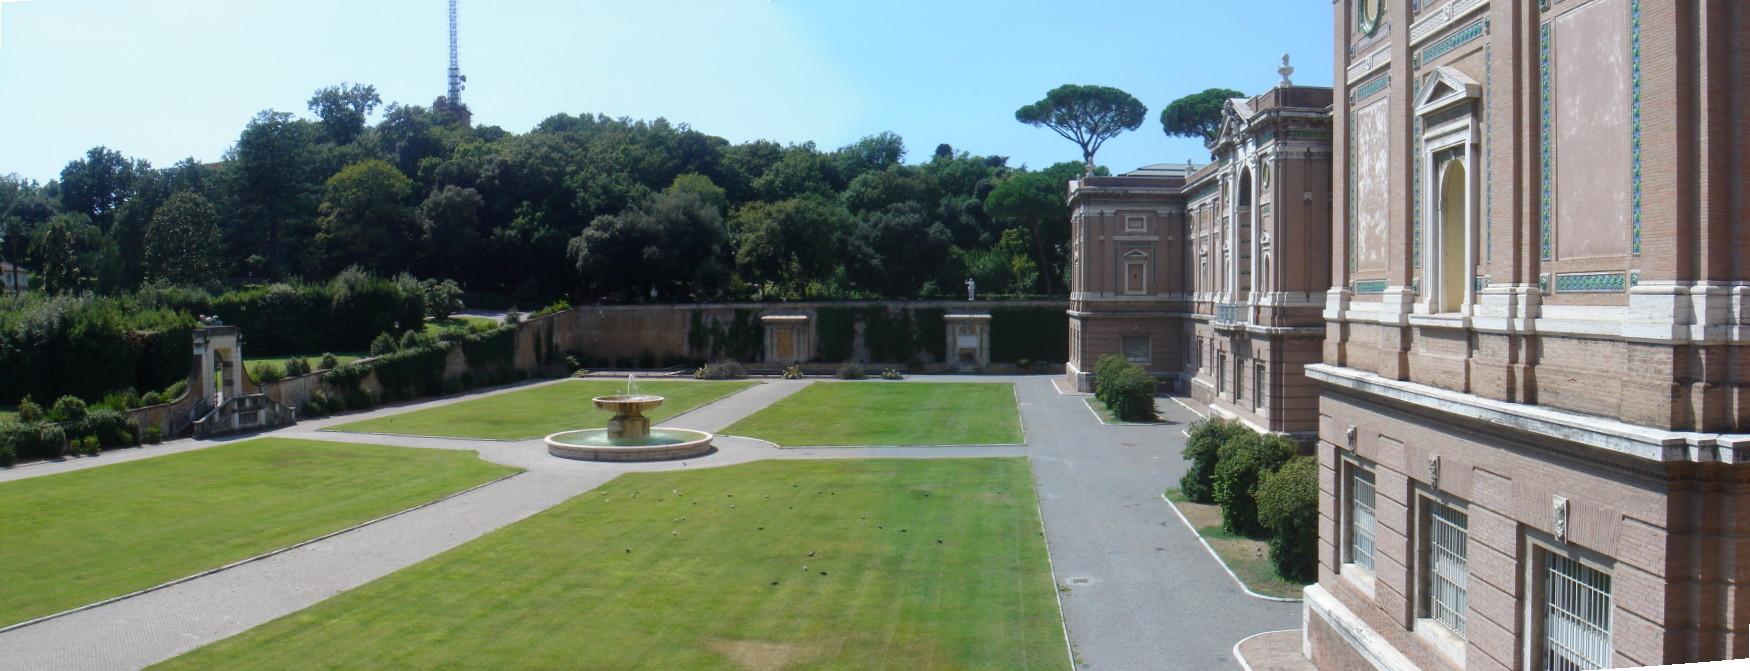 musei-vaticani-giardini-01102-3